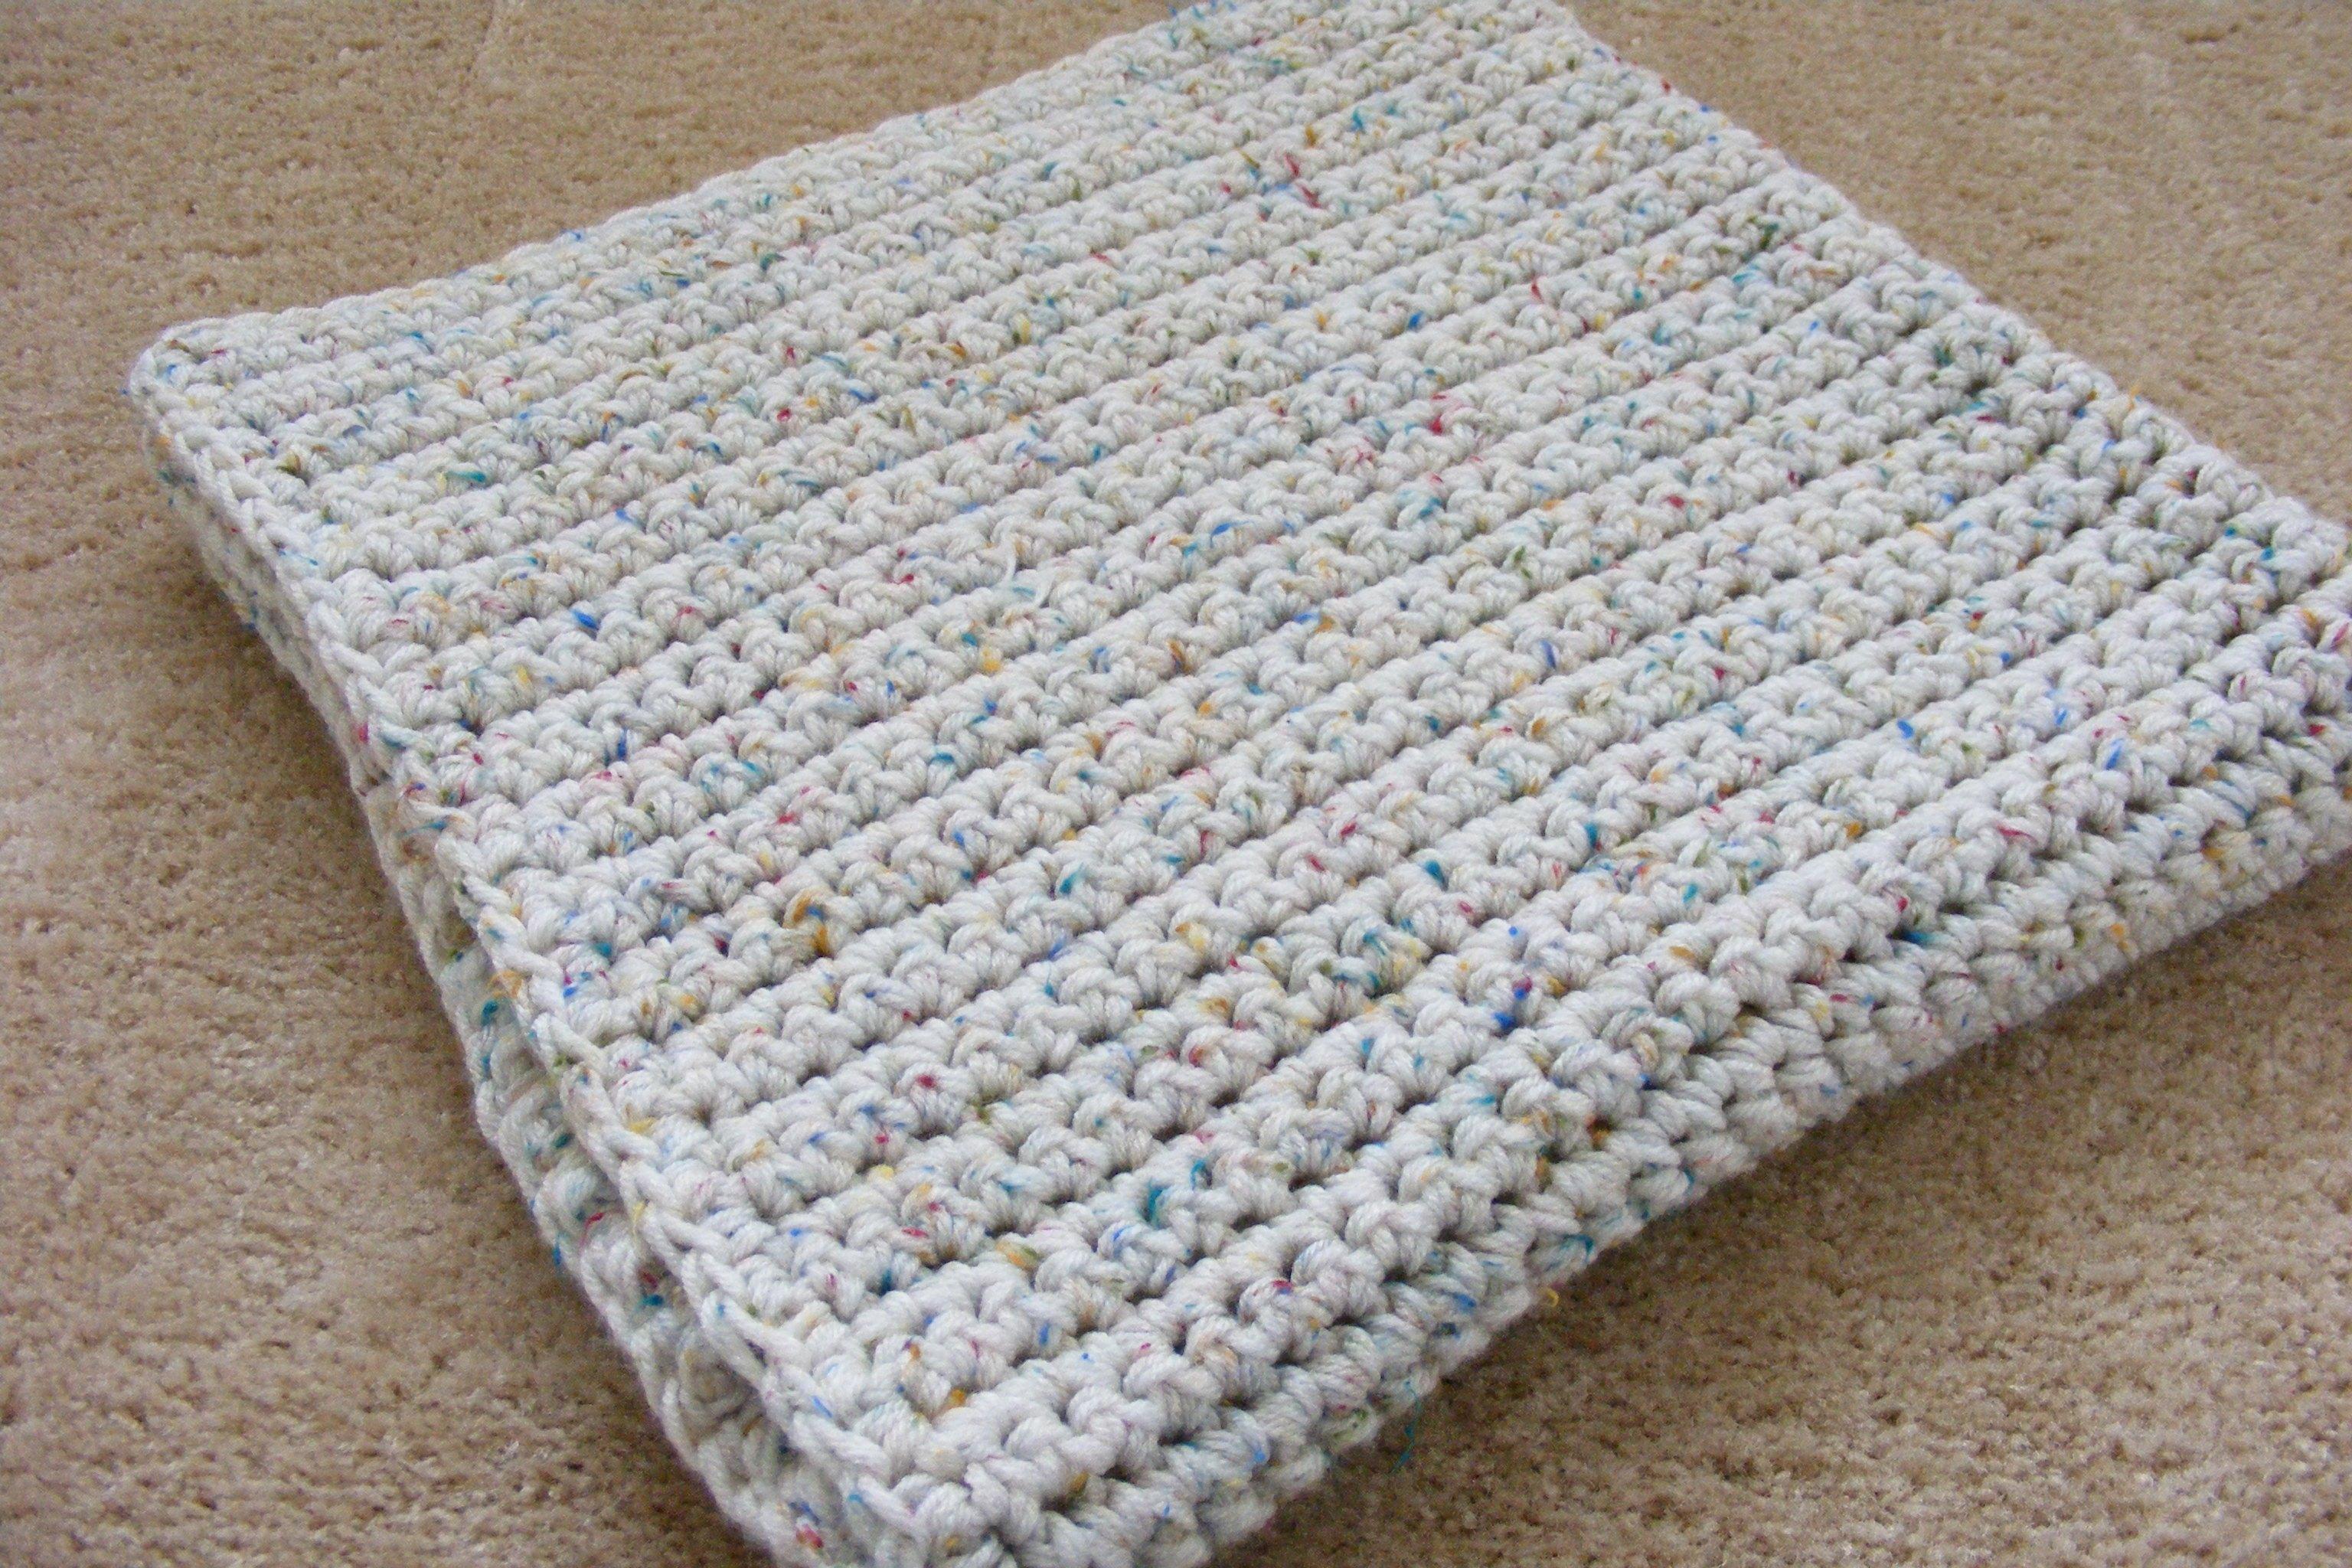 Lapghan Crochet Patterns Free Free Crochet Lapghan Pattern ...